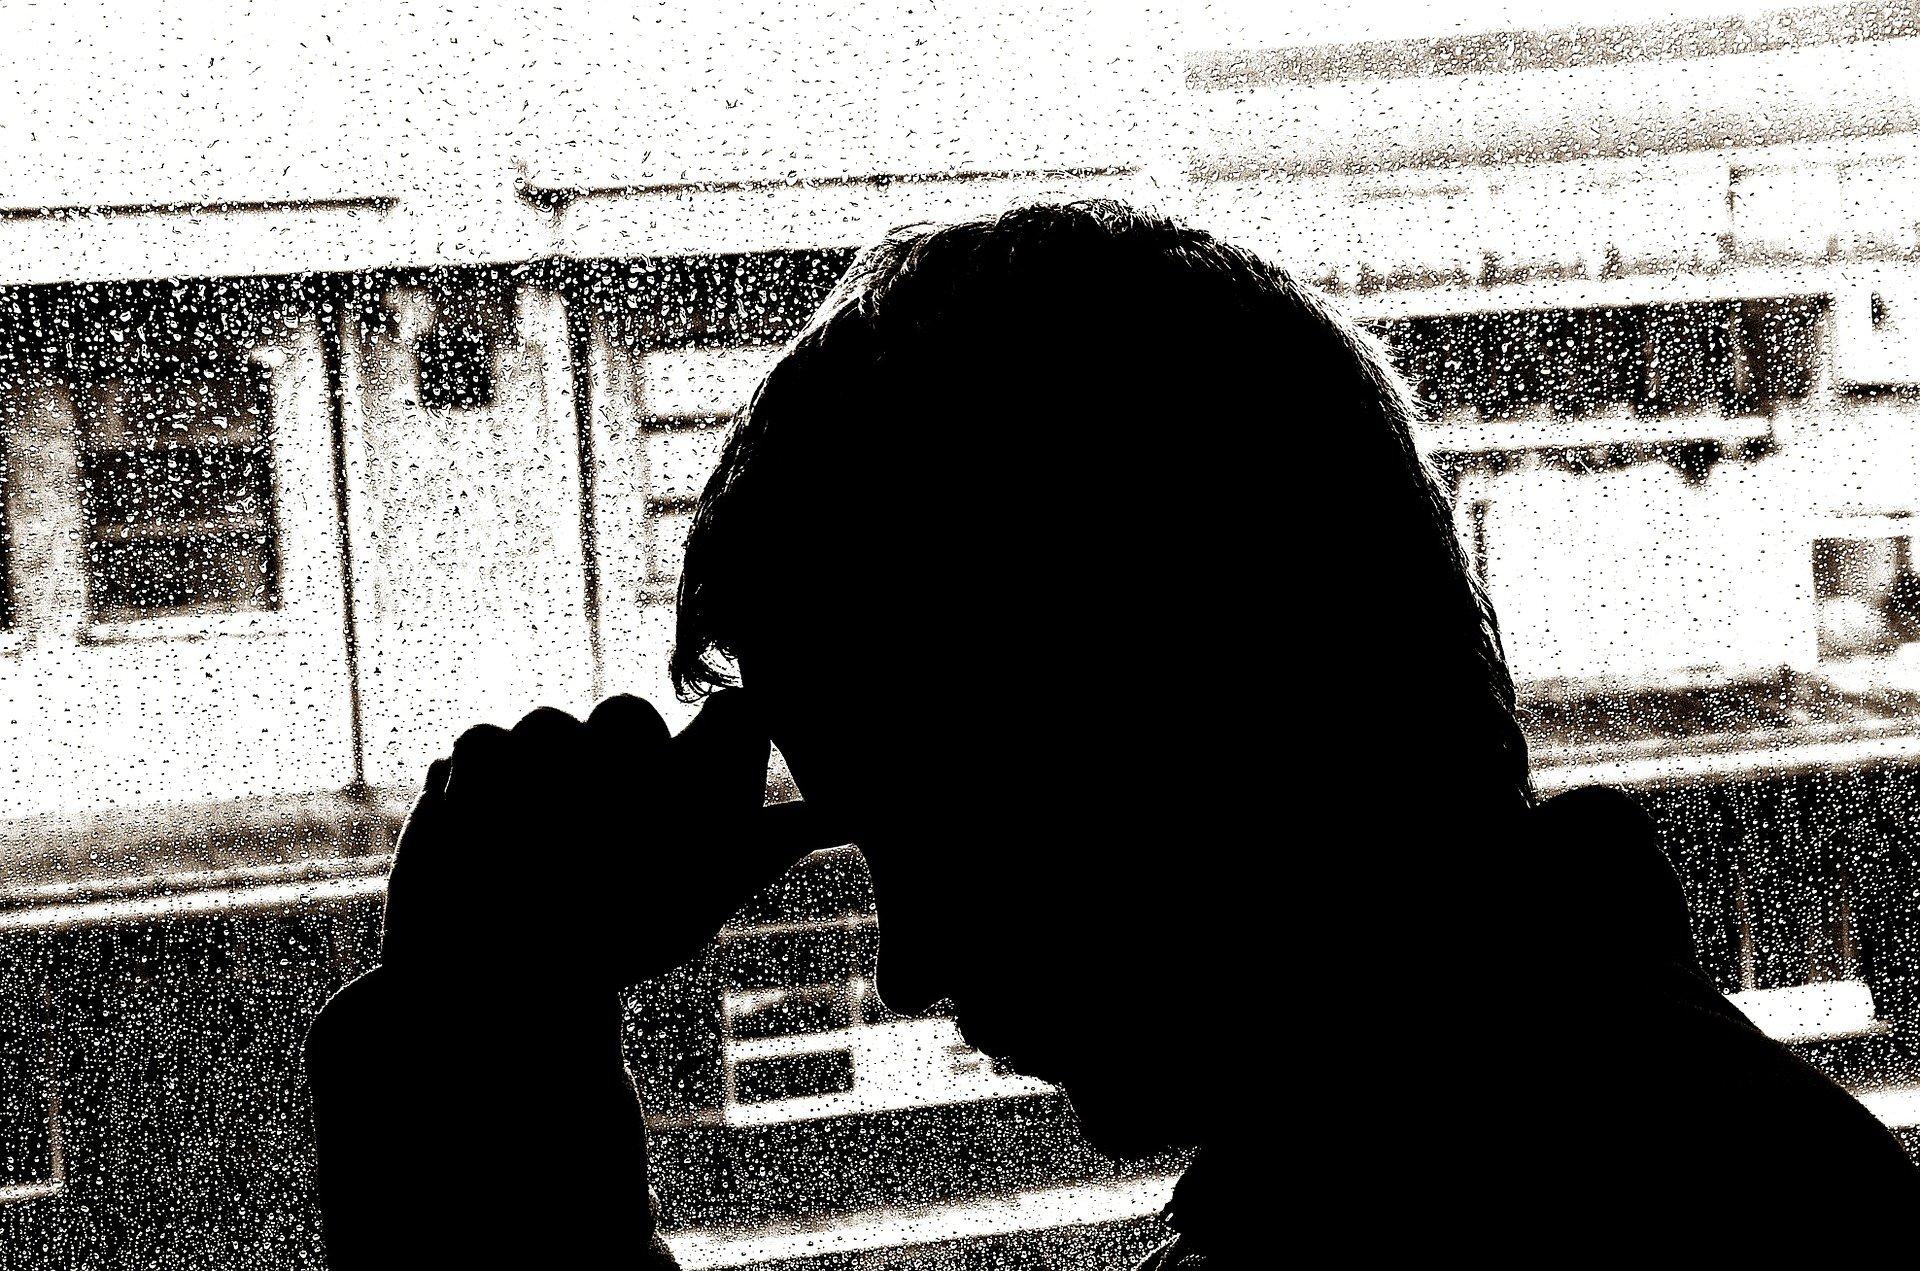 depression-20195_1920.jpg